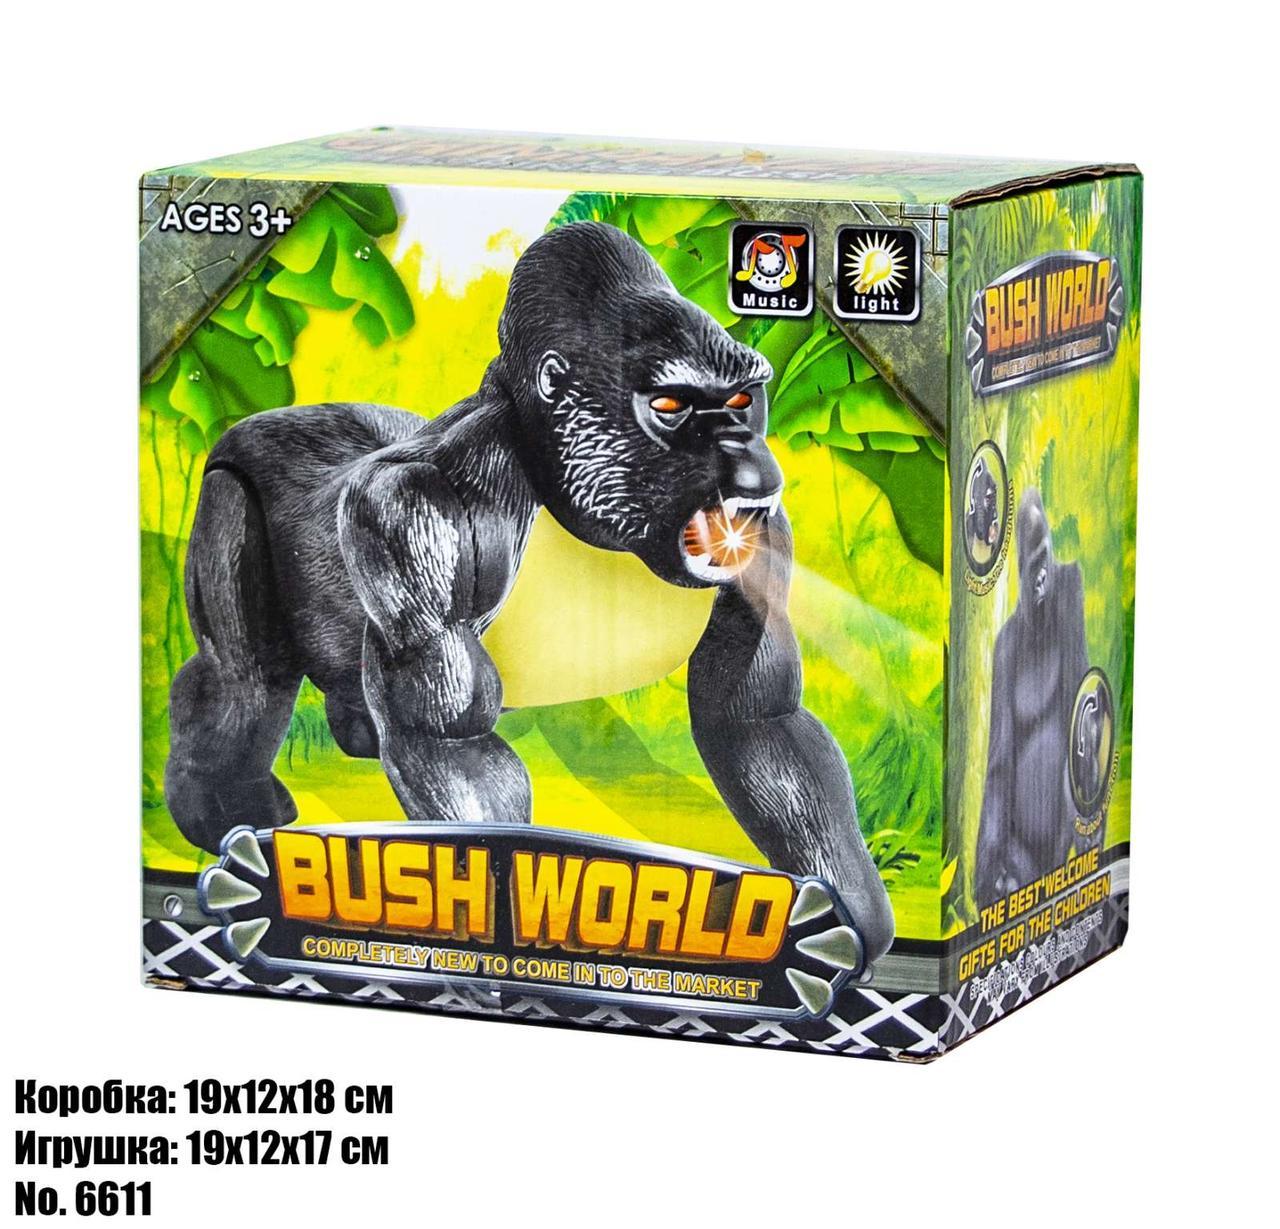 Интерактивная игрушка Buch Word горилла Кинг Конг